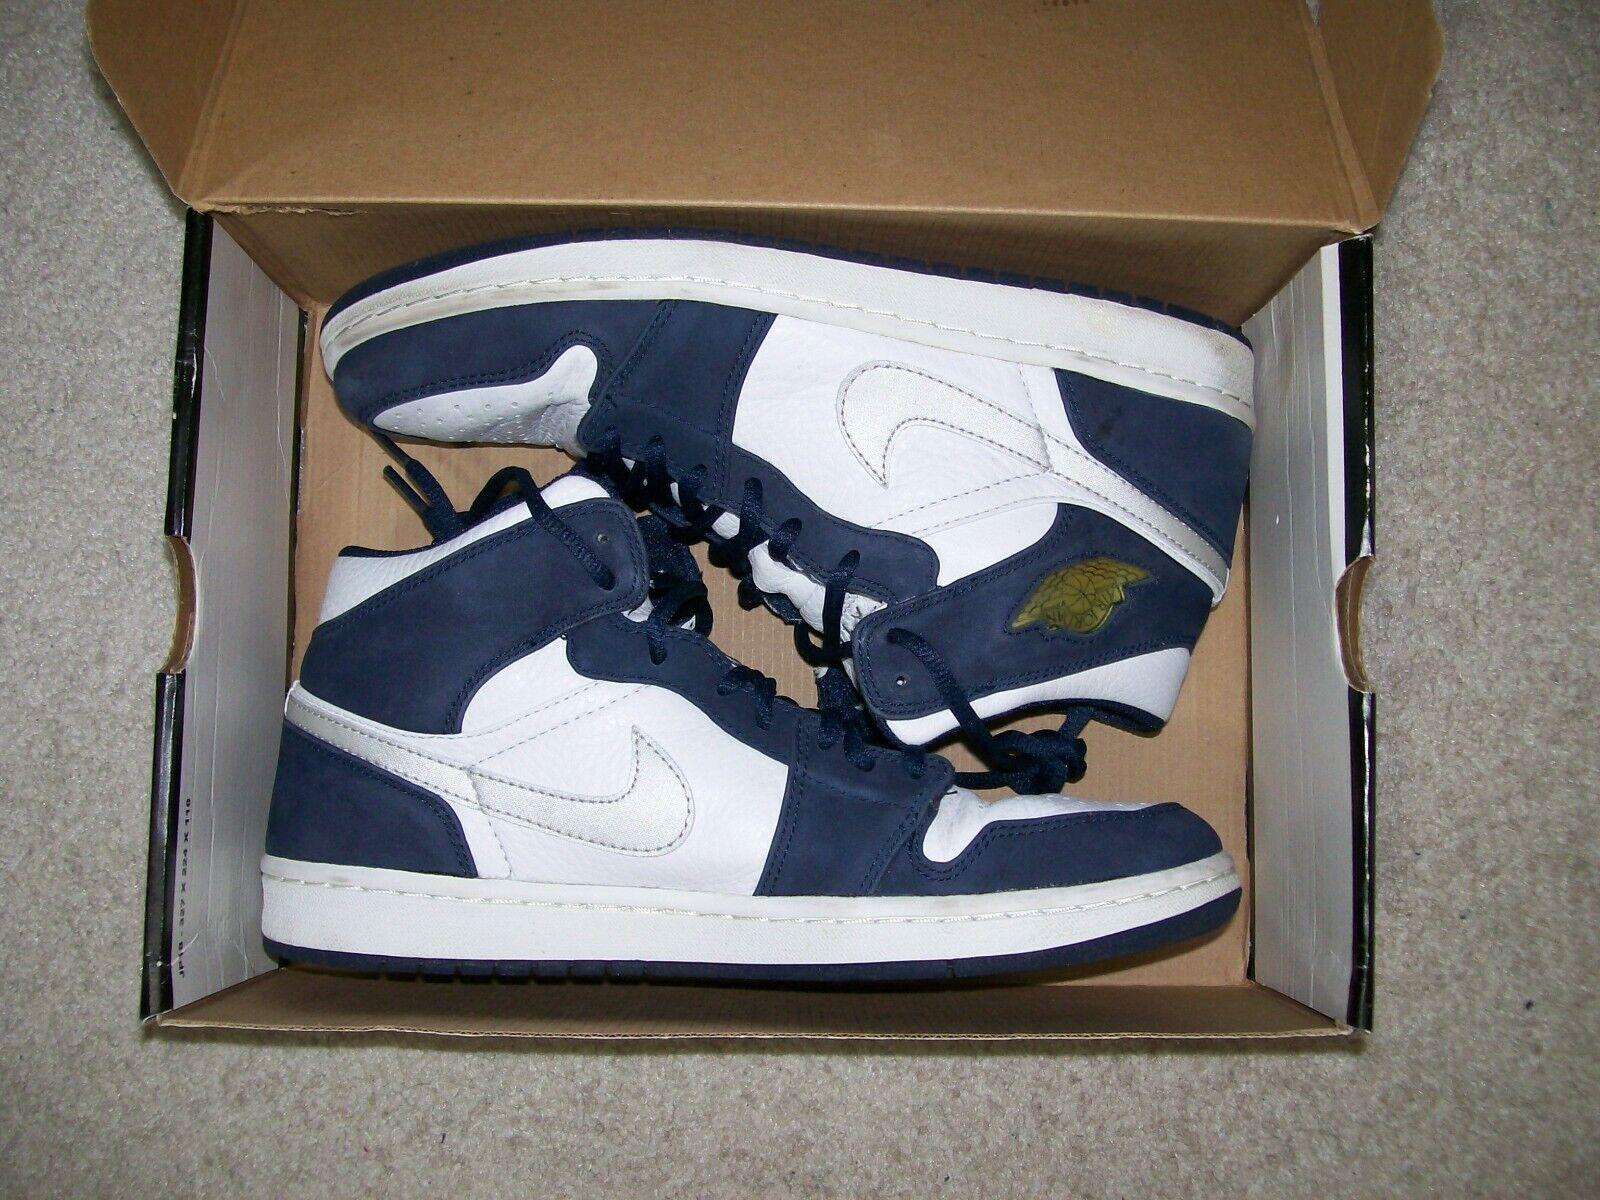 2001 NUMBERED 10.5 Nike Air Jordan 1 Retro+ Midnight Navy 136065-101 Bred Royal